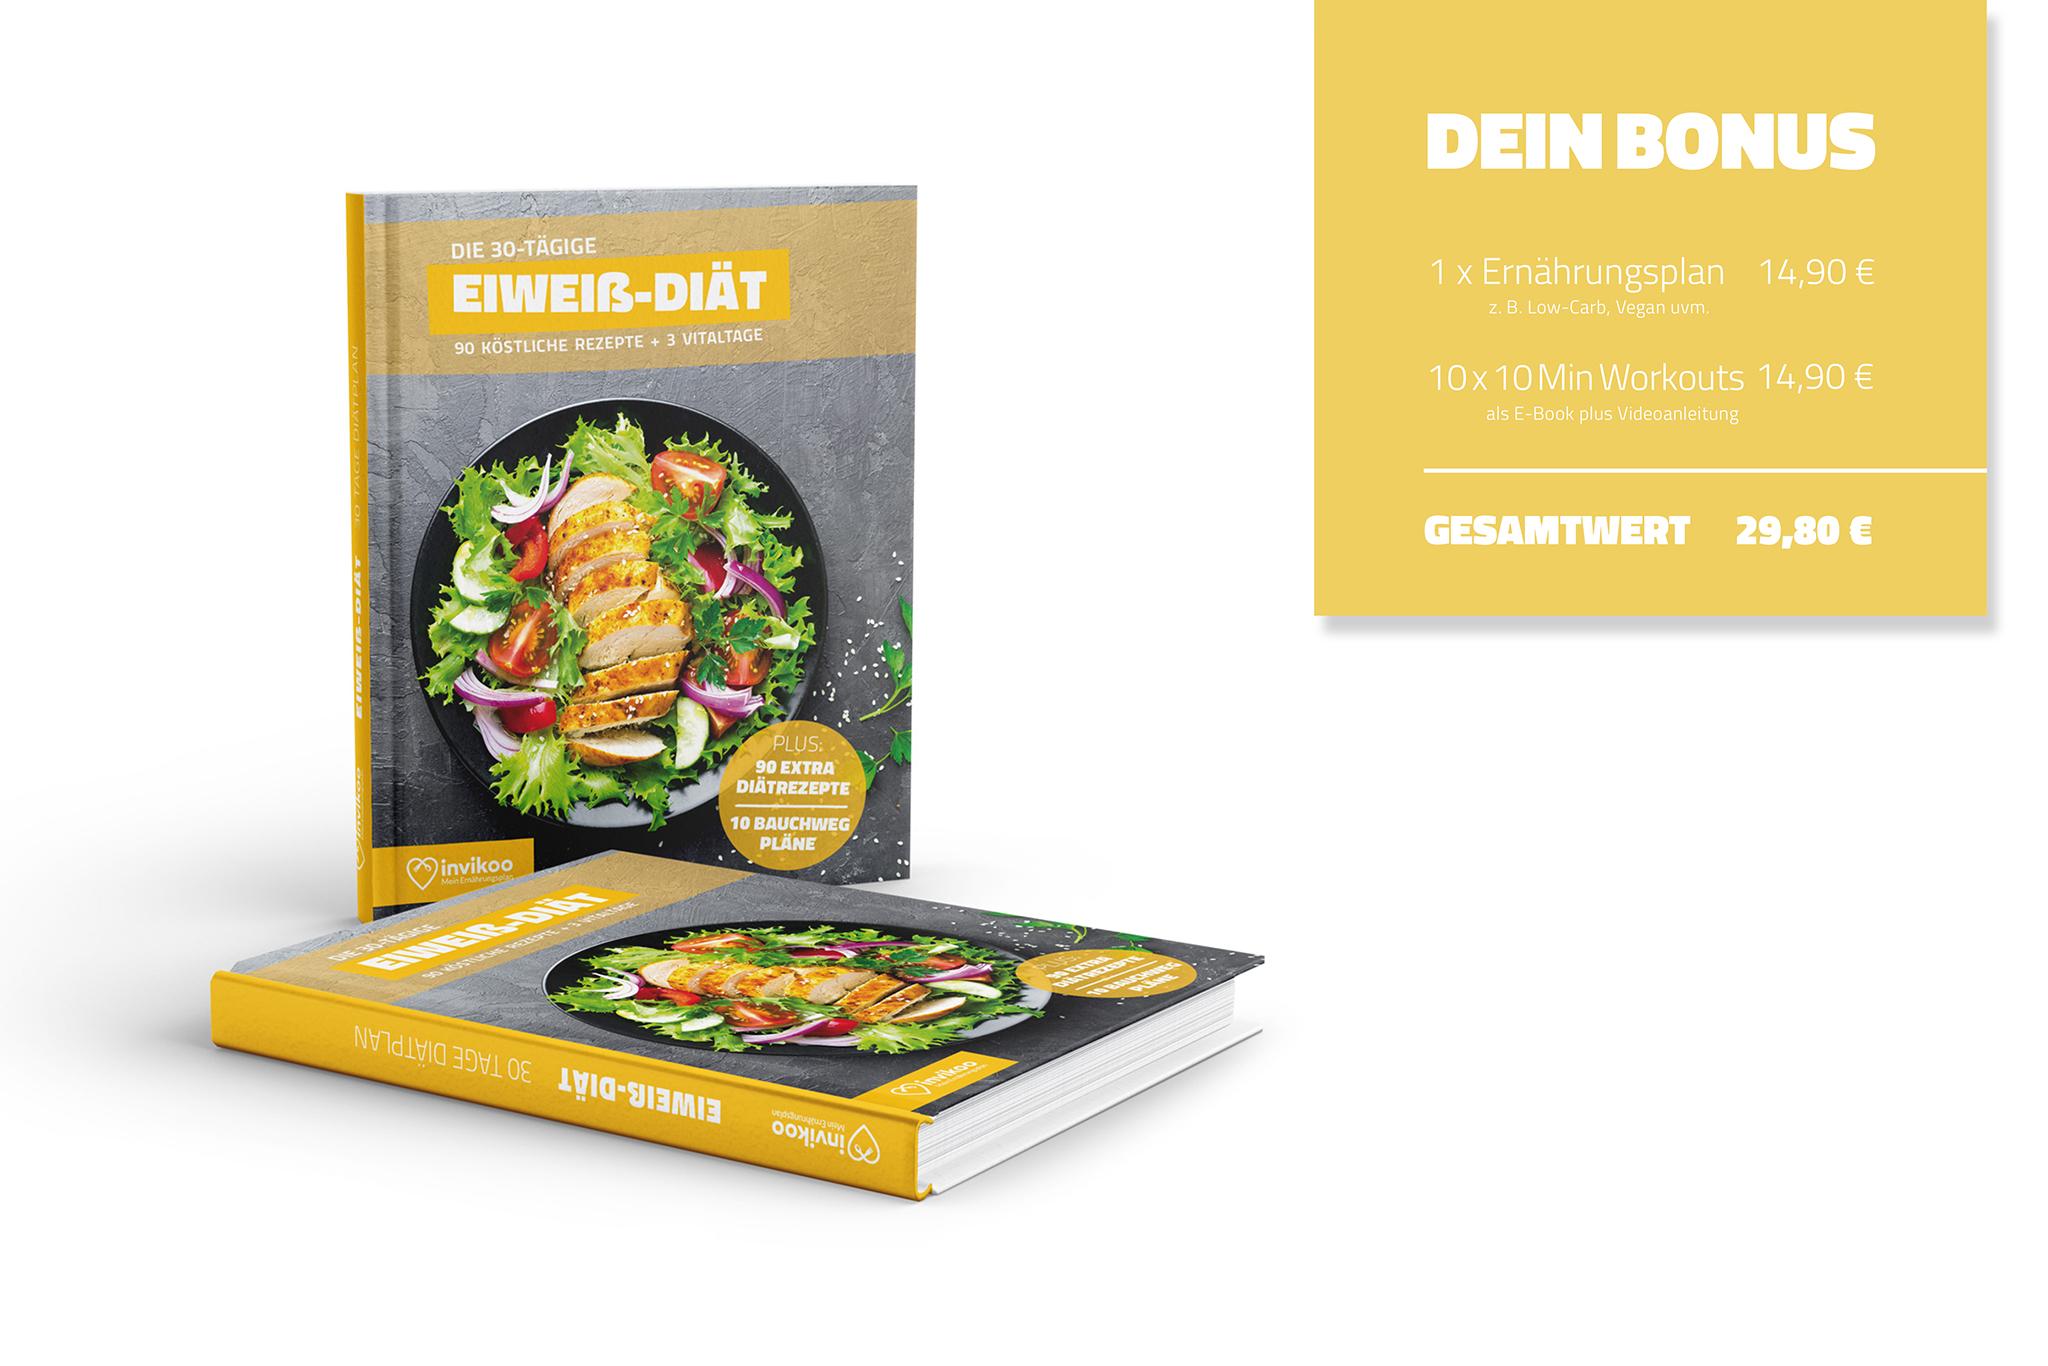 high-protein-kochbuch-abnehmen-bonus